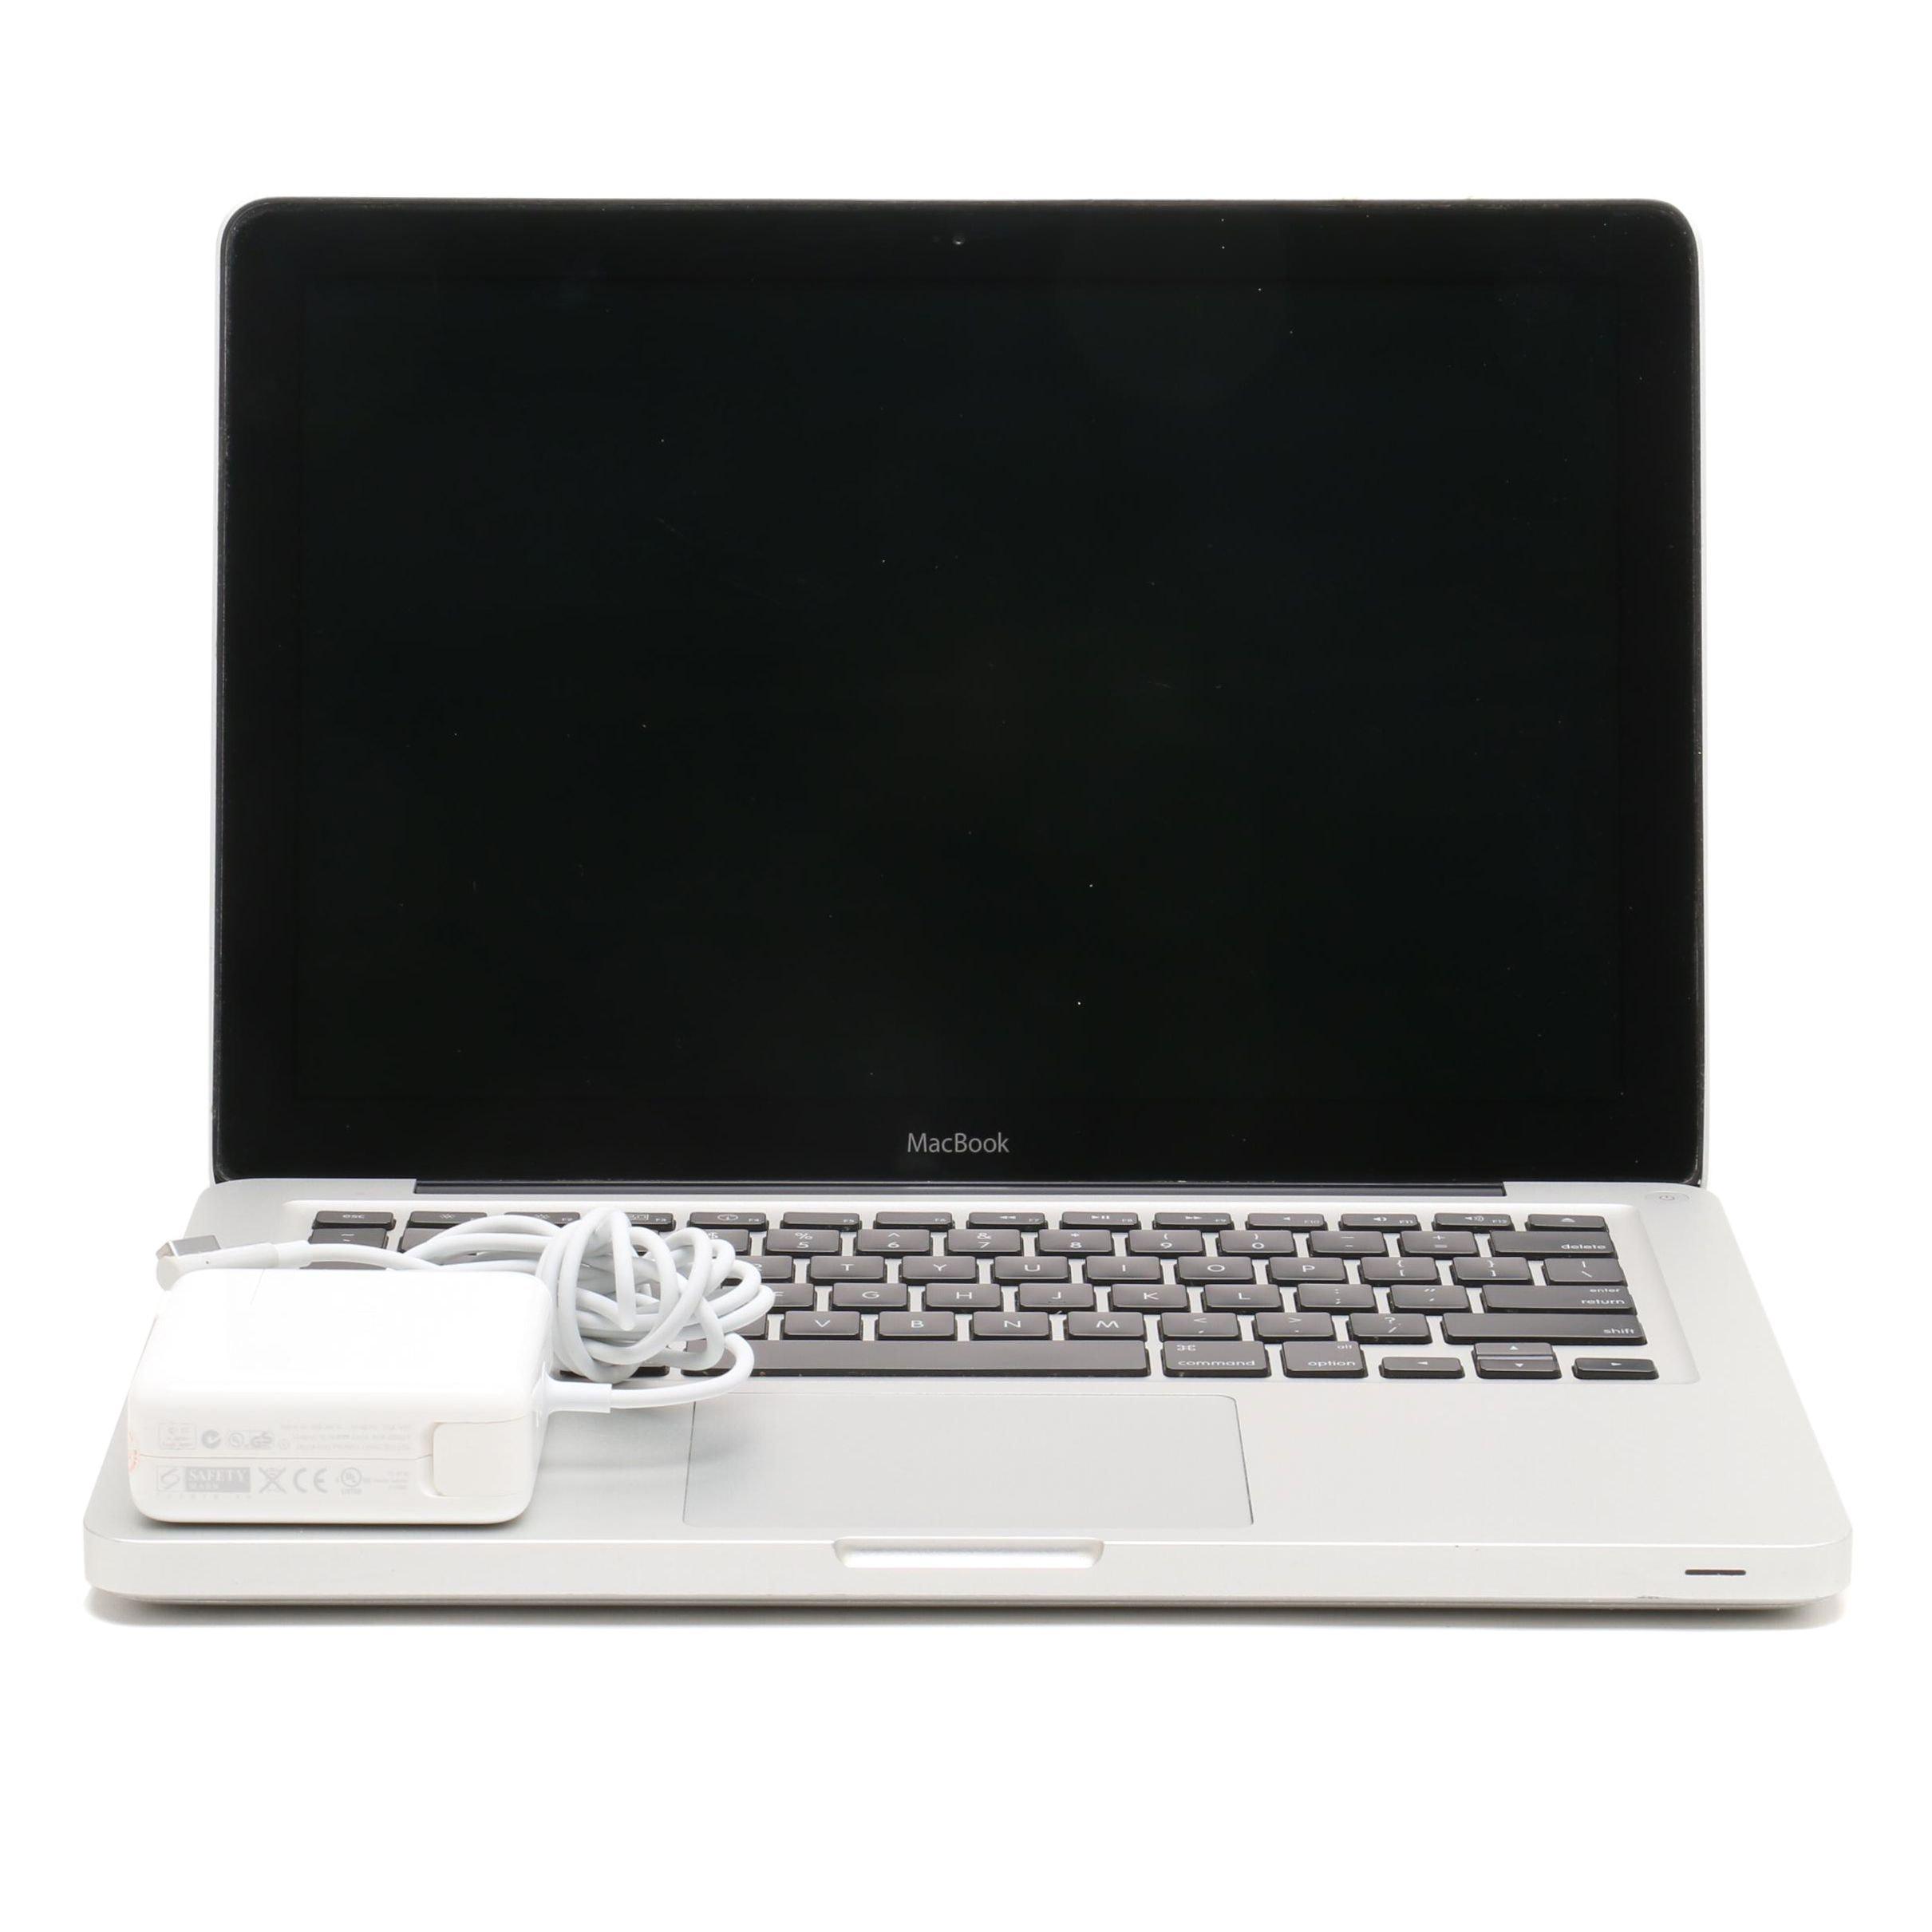 "13"" Apple MacBook Laptop"